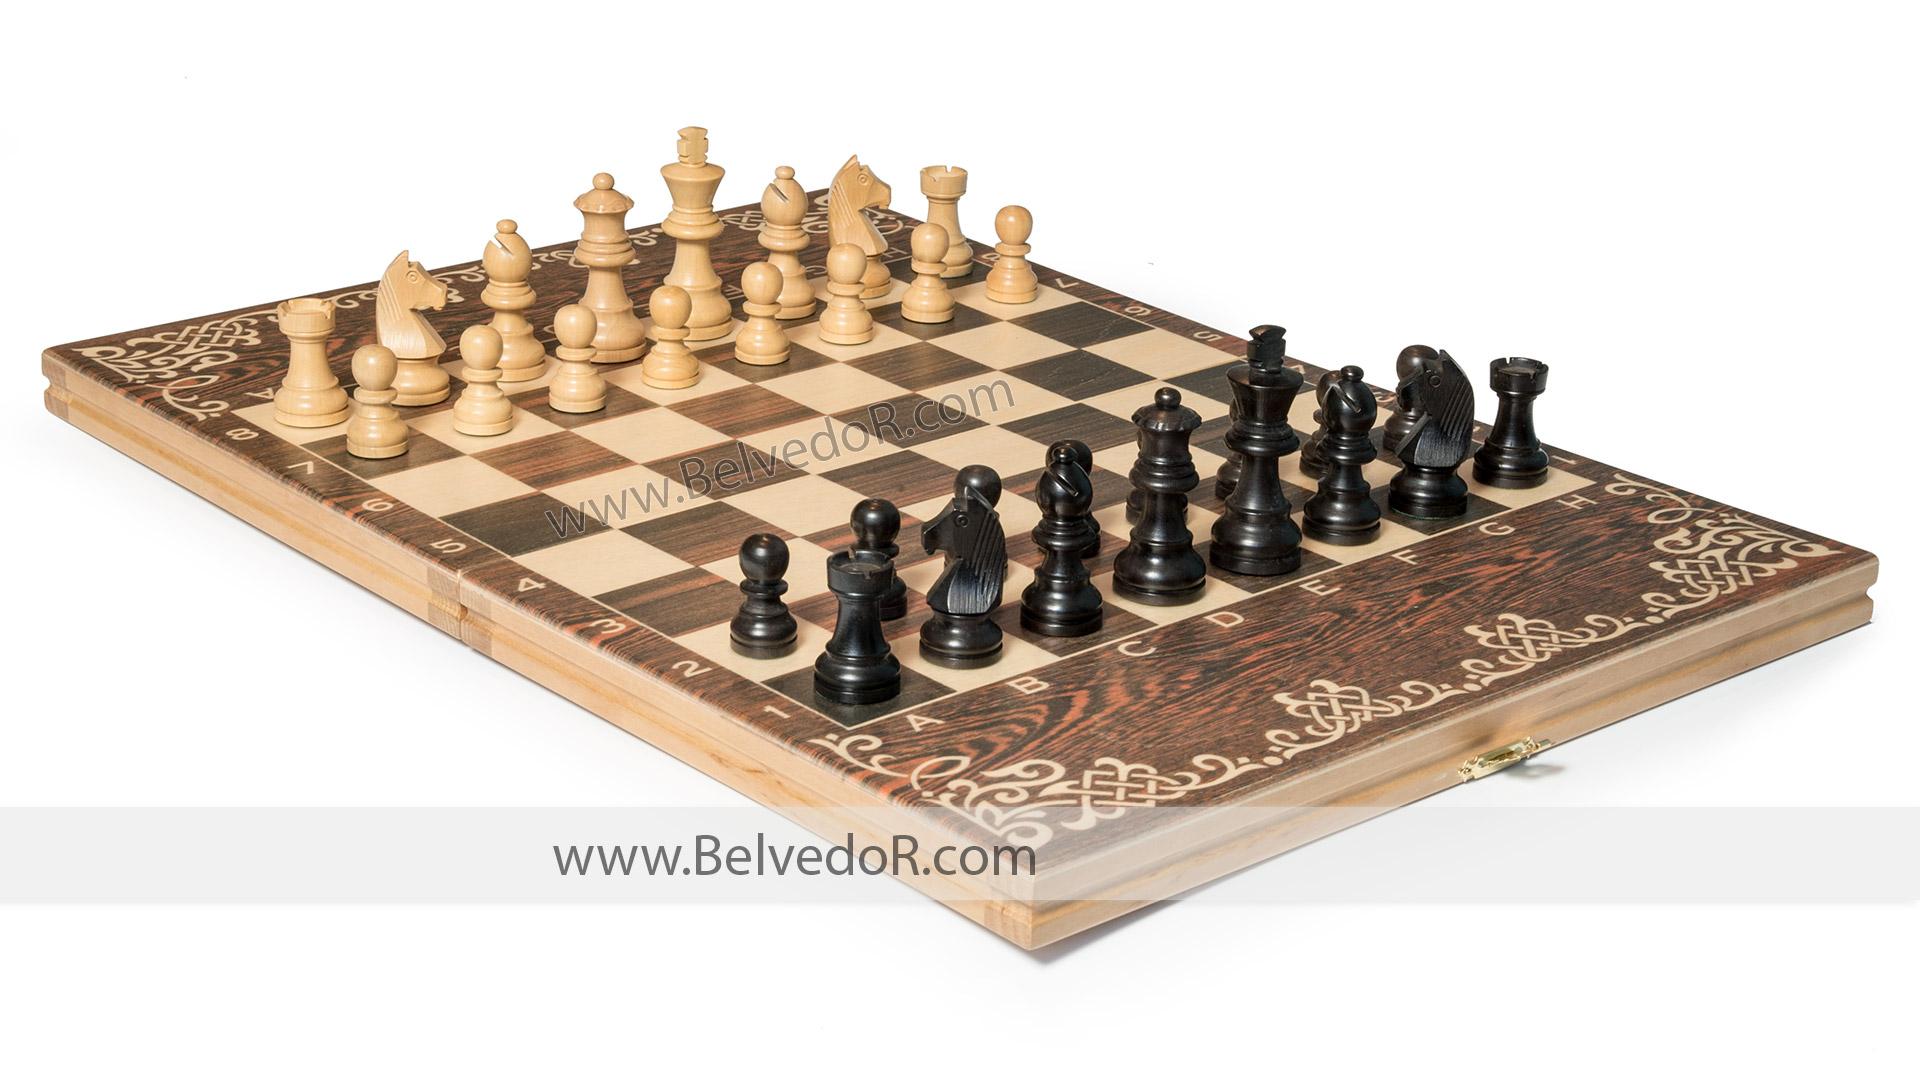 Шахматы малые фигуры самшит, эбен, король 7,6см, доска 35х50см